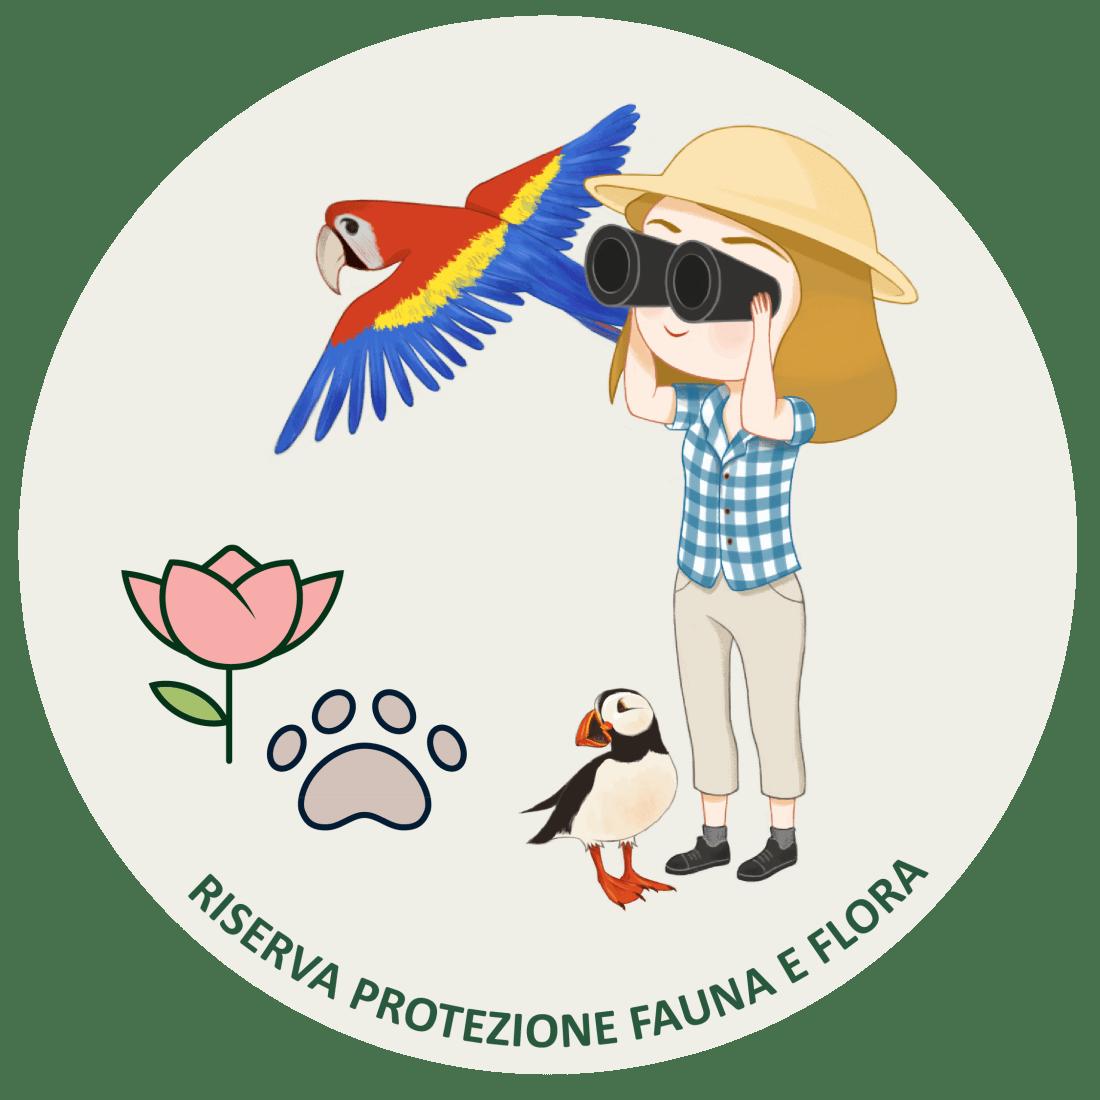 riserva fauna e flora